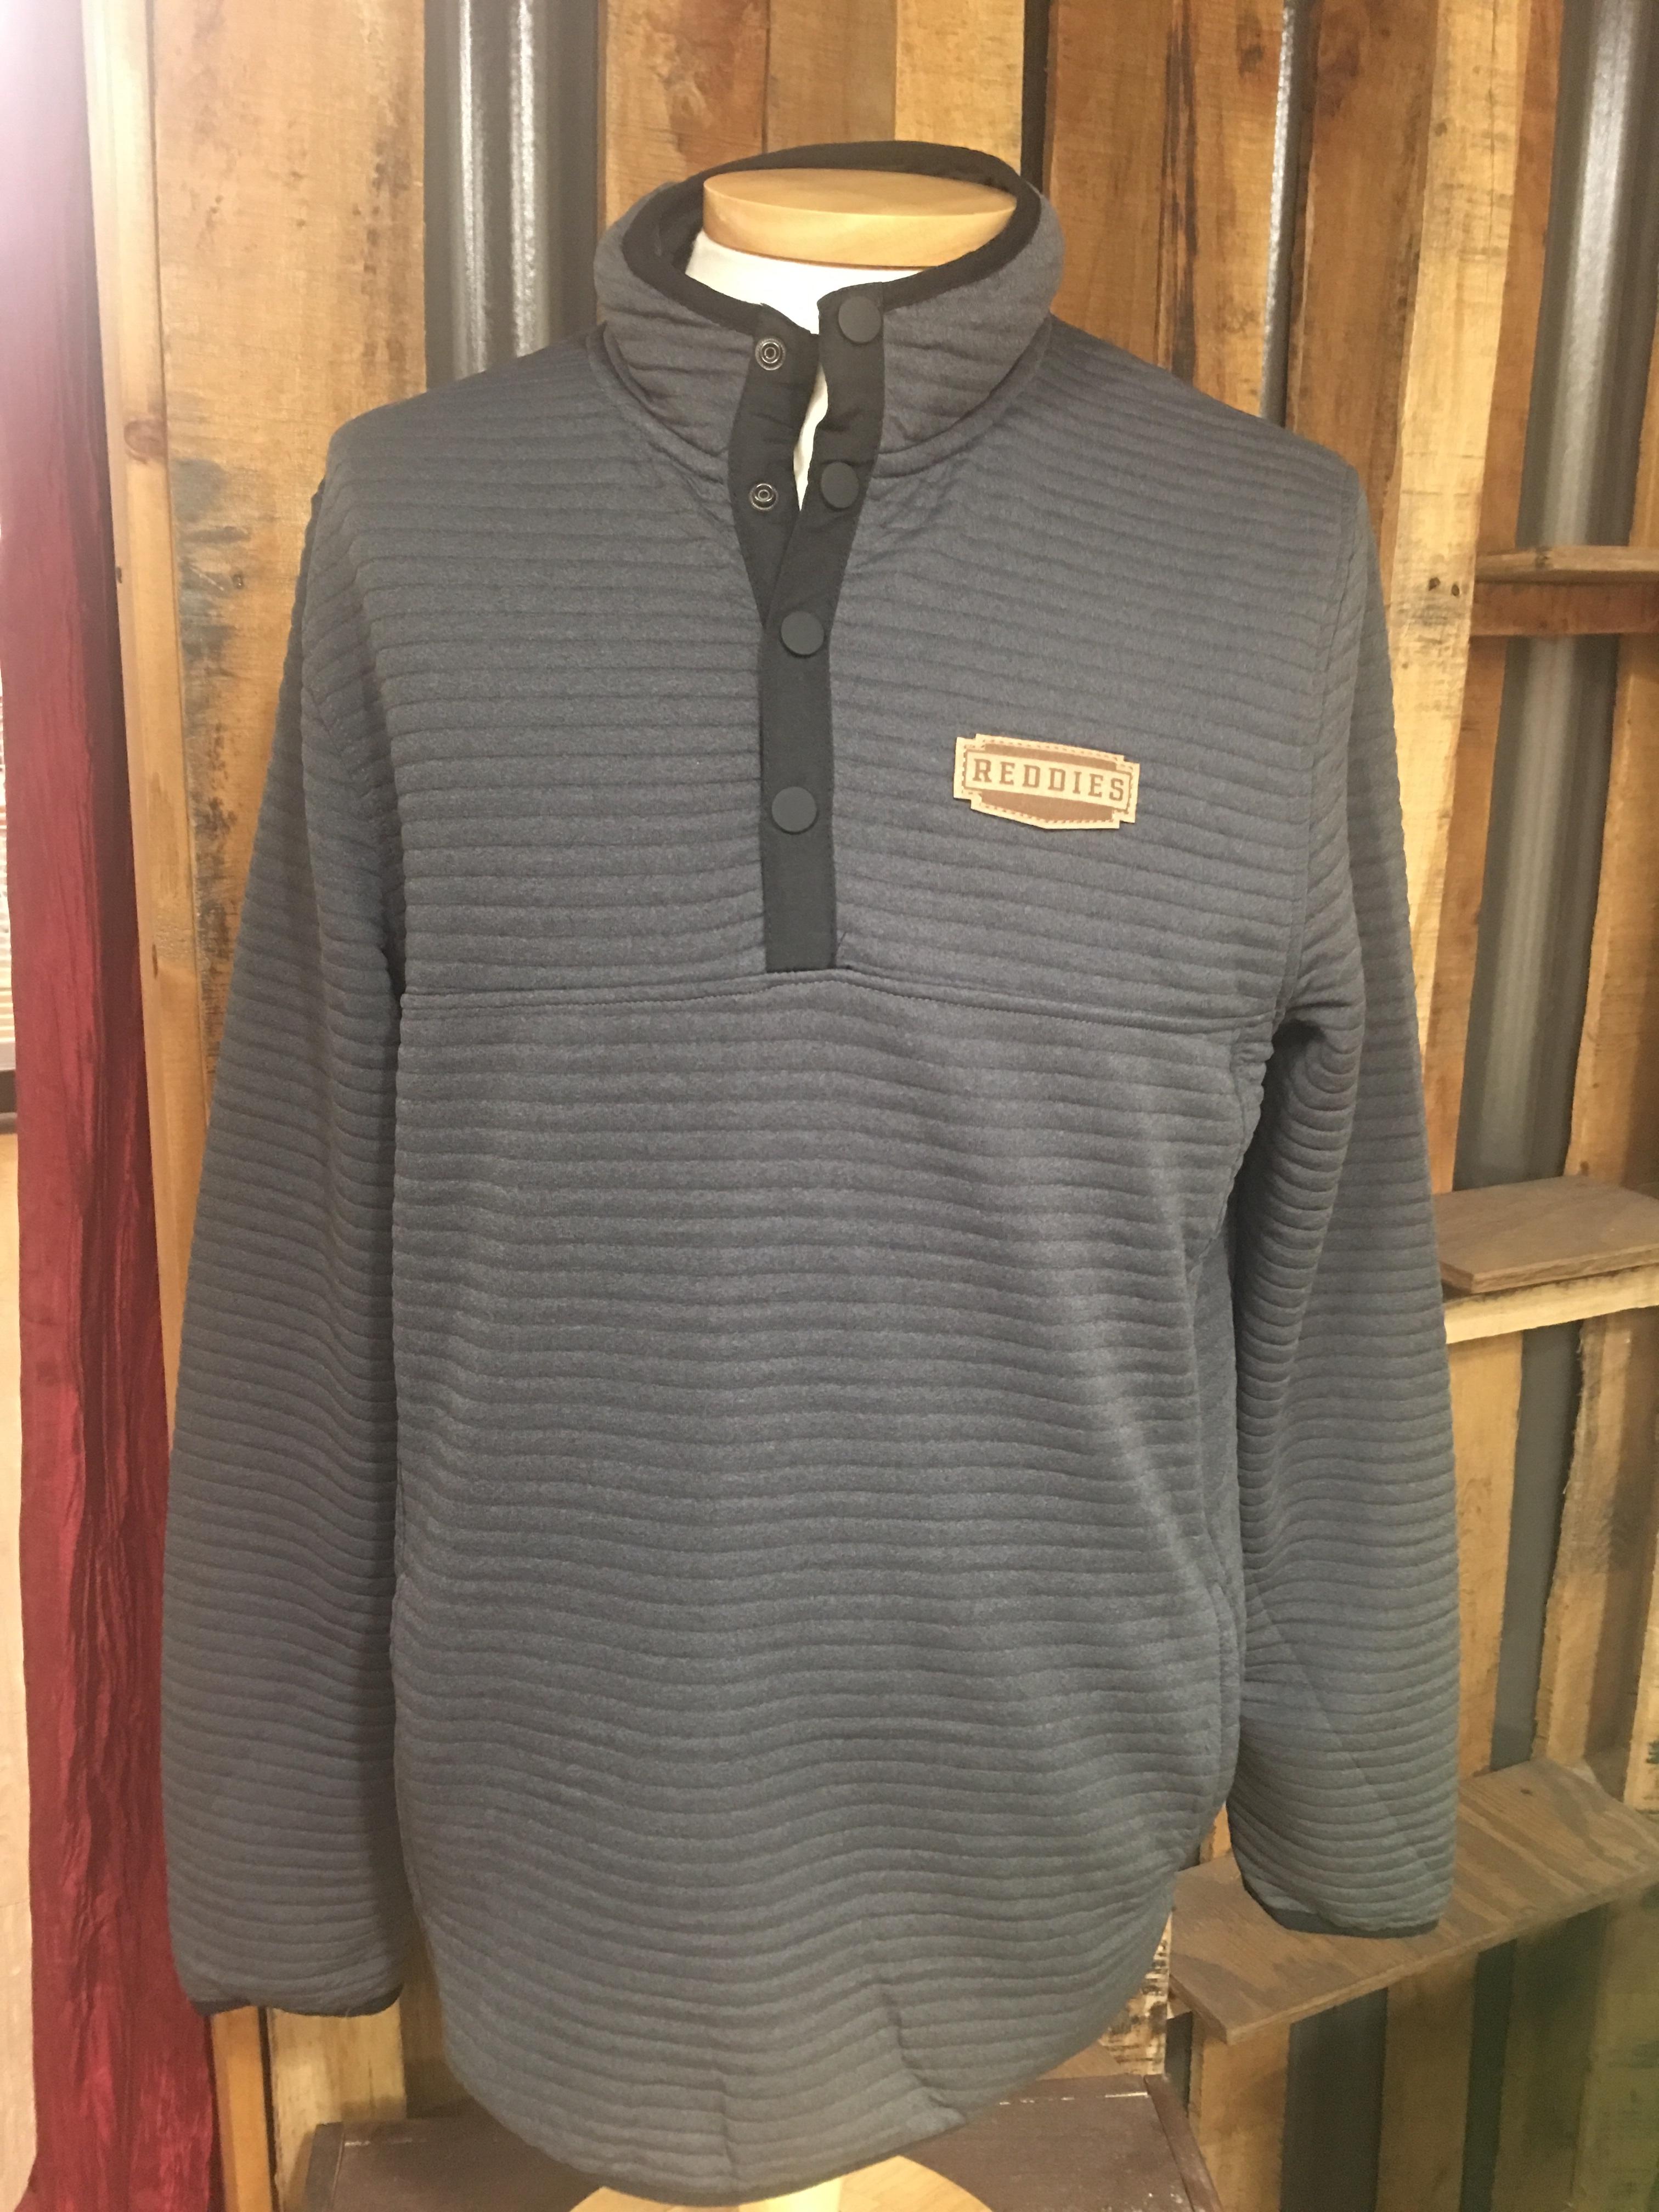 Reddies Chase 1/4 Snap Long Sleeve Shirt